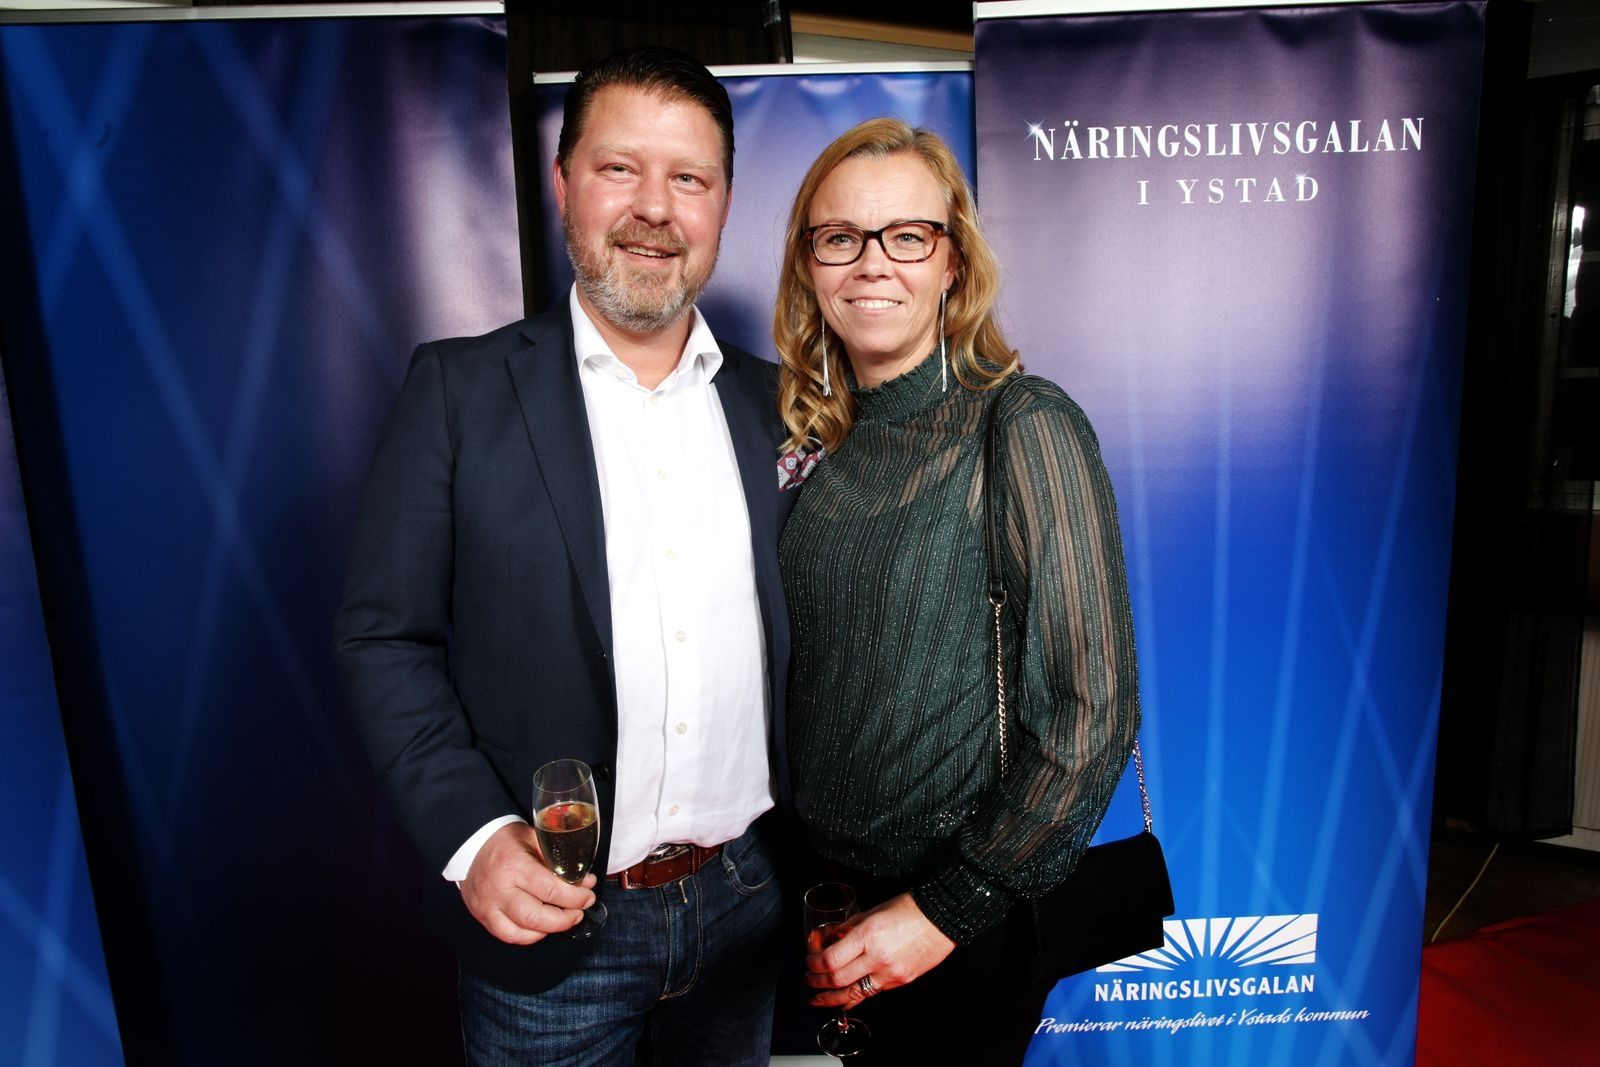 Mattias Forsman och Susanna Thuresson, Sparbanken syd